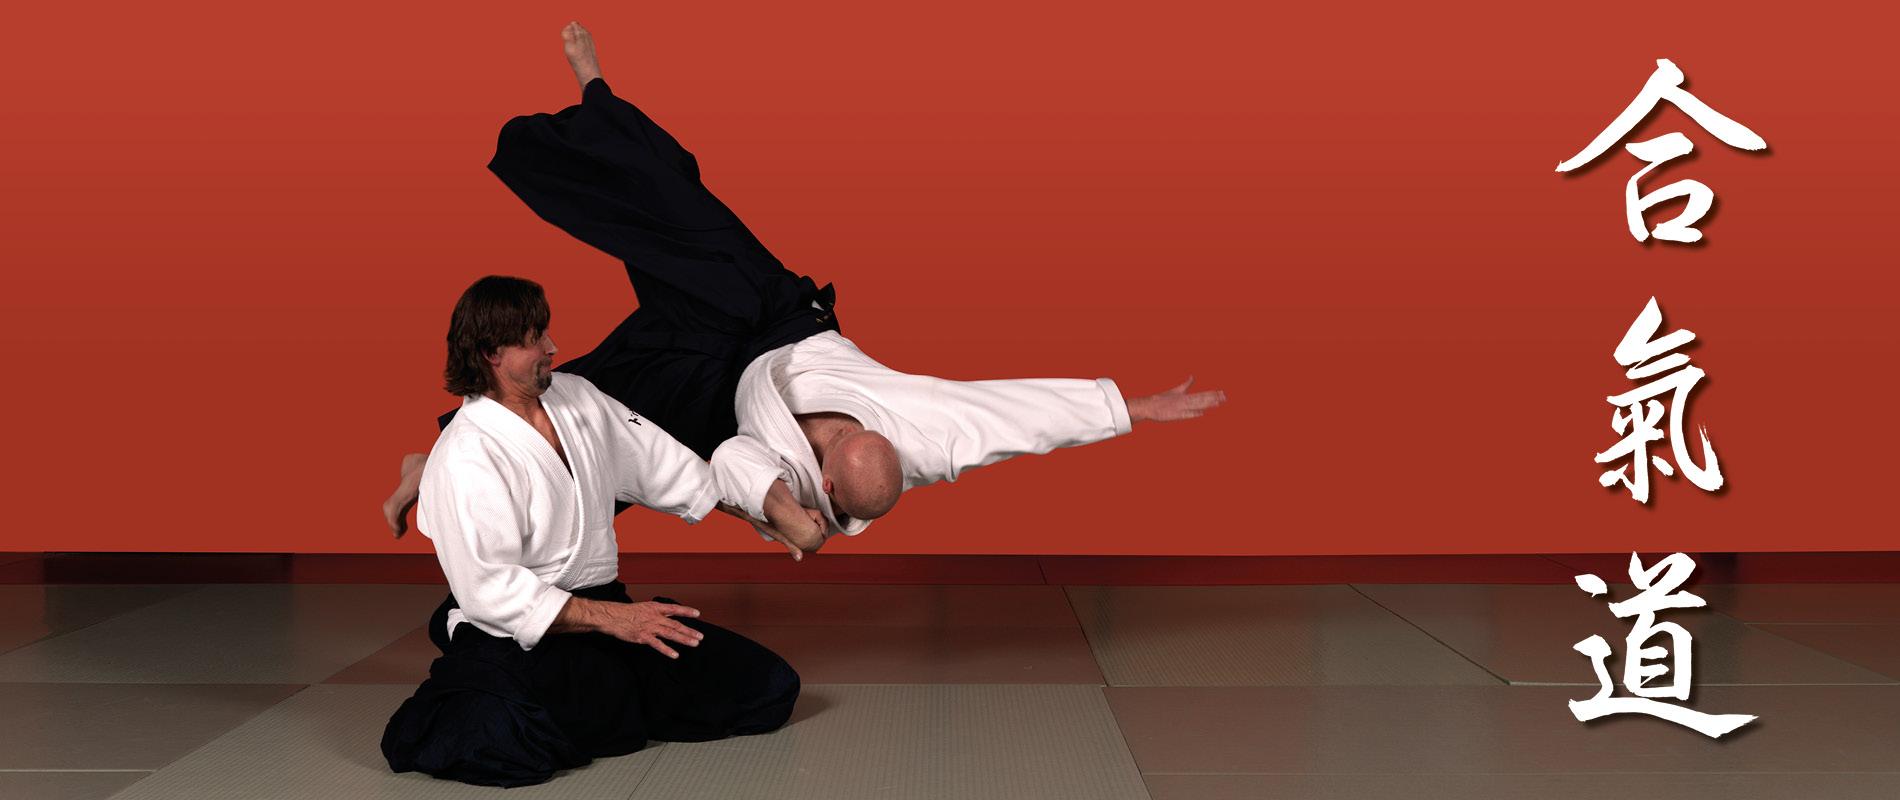 Aikido header afbeelding v4 2